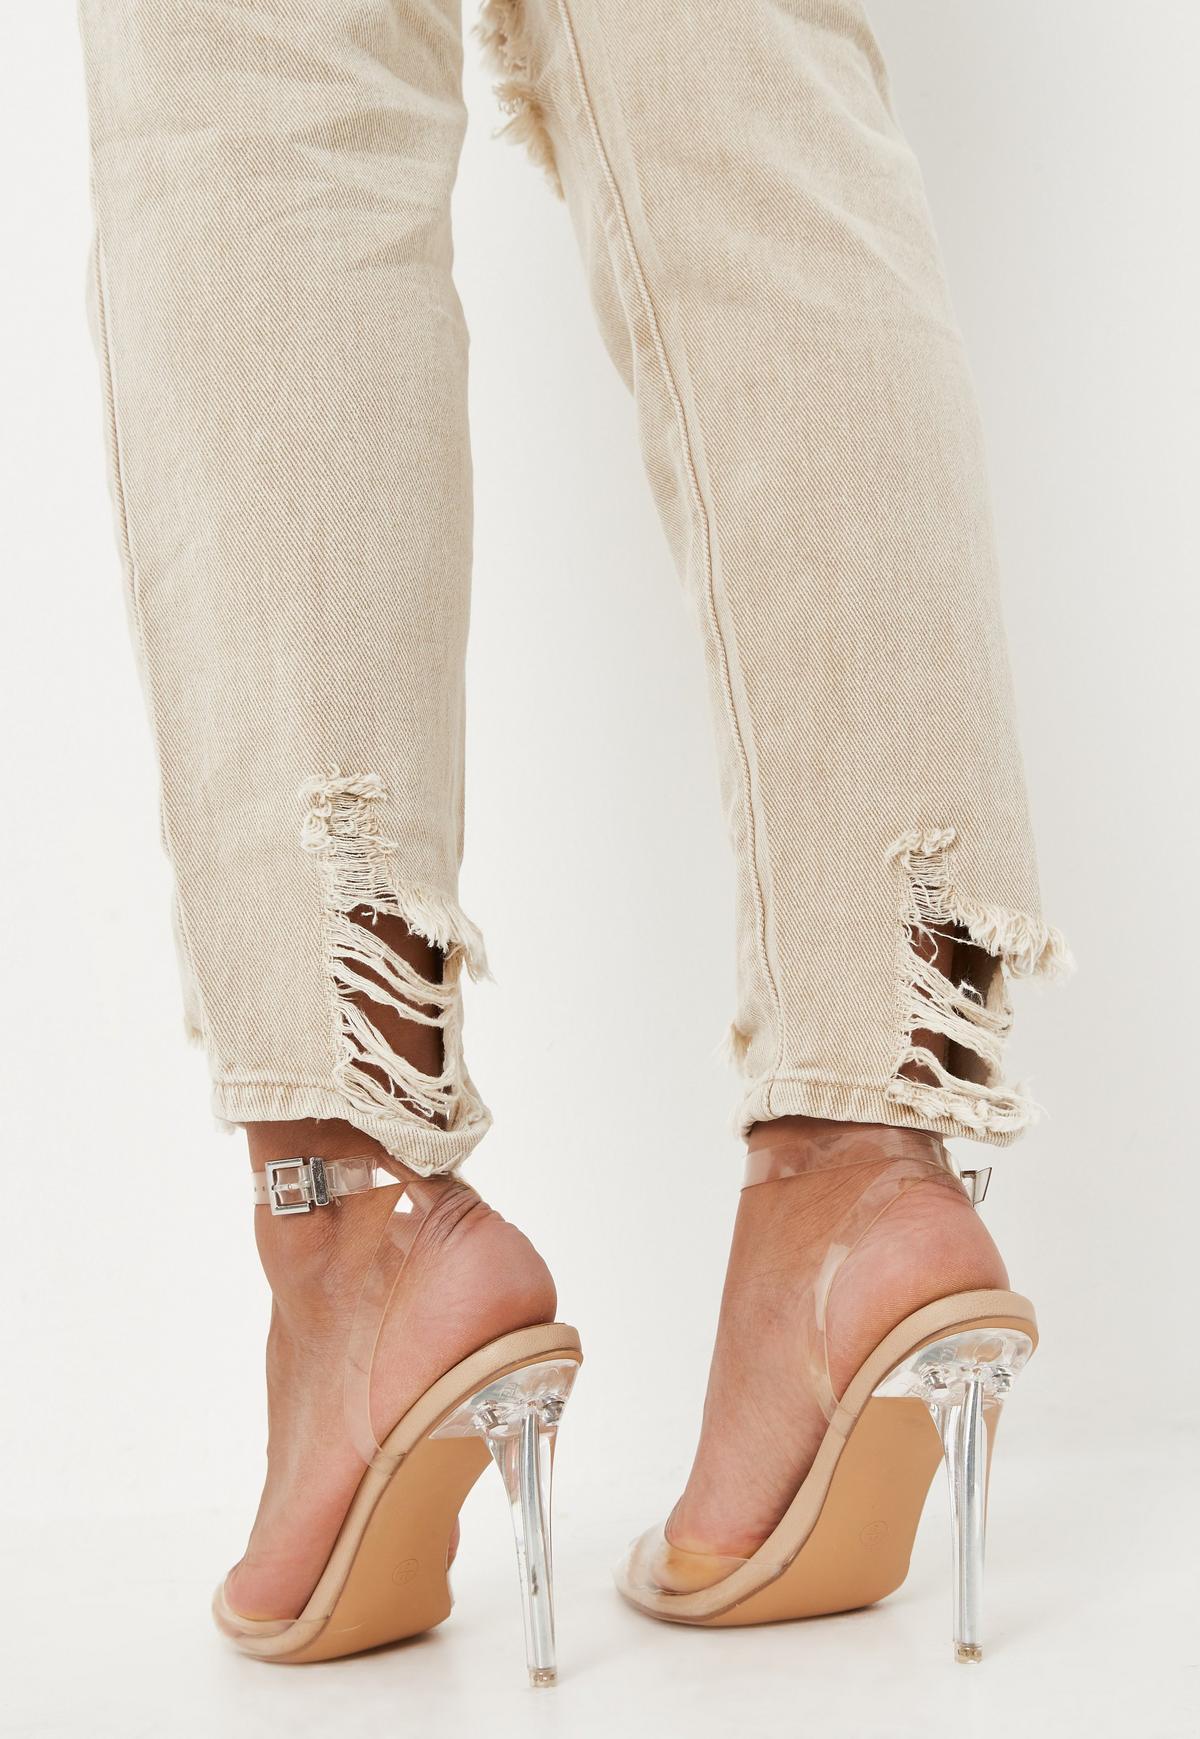 Sand coloured jeans